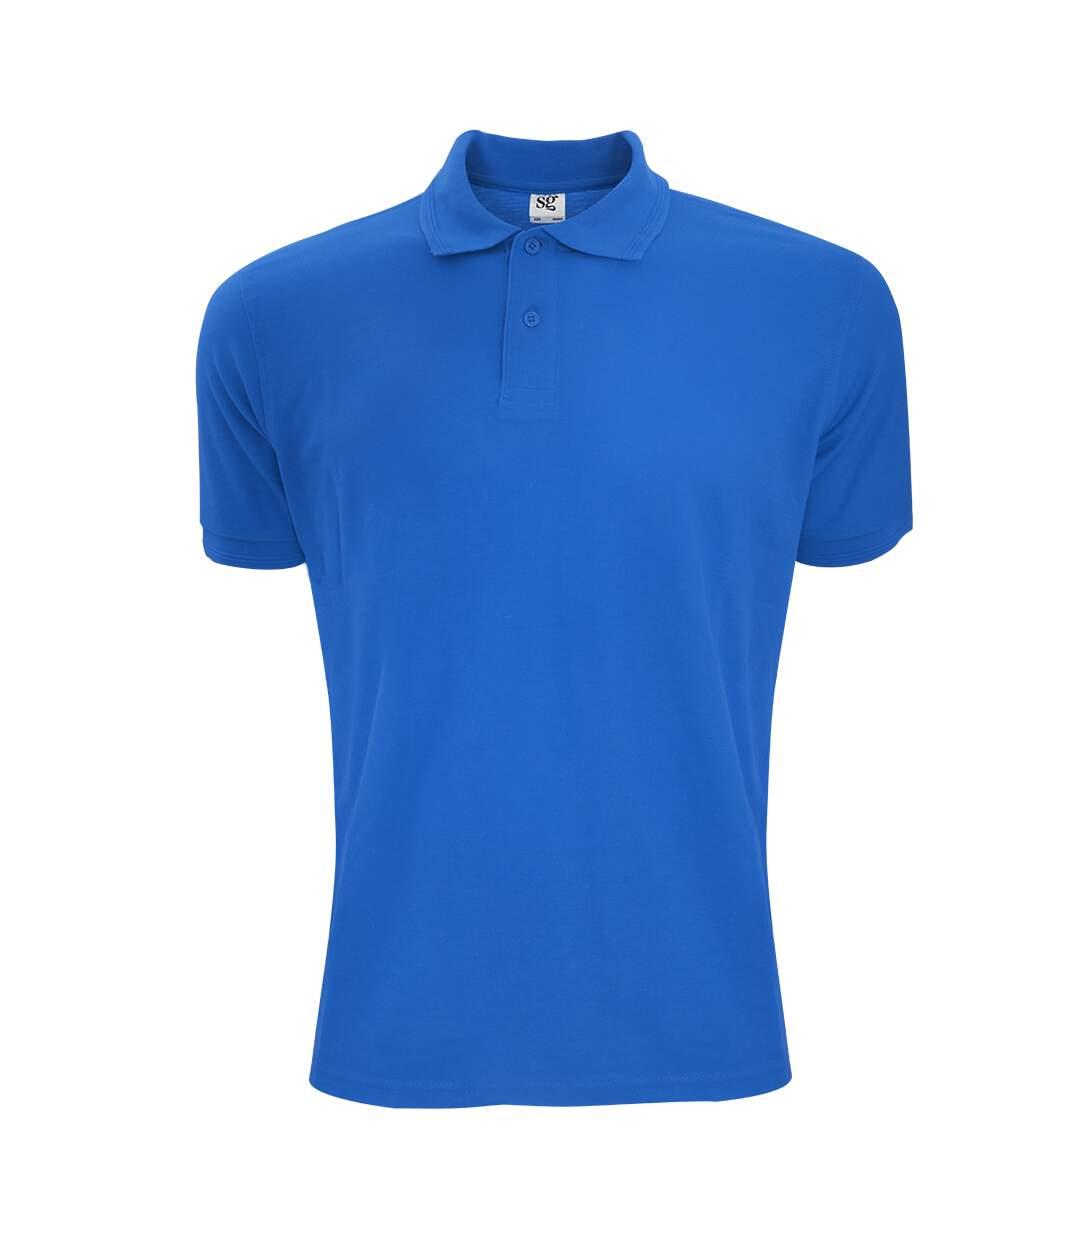 SG Mens Polycotton Short Sleeve Polo Shirt (Royal) - UTBC1084